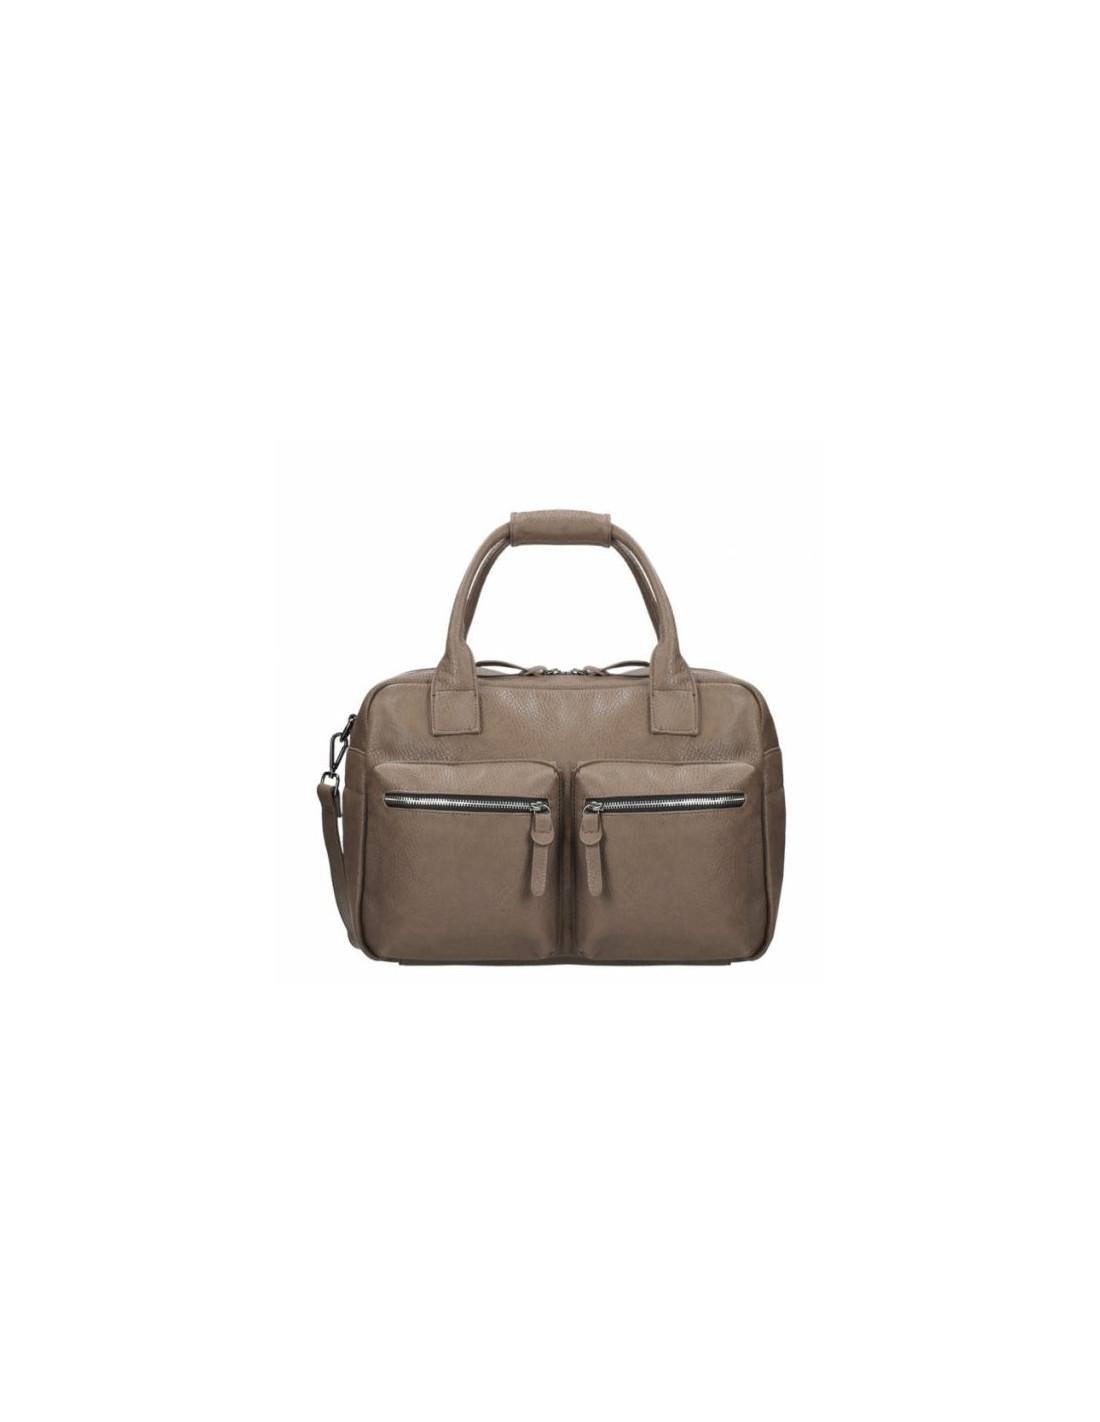 Schoudertas Taupe : Wimona schoudertas donkerblauw fuchsia koffer